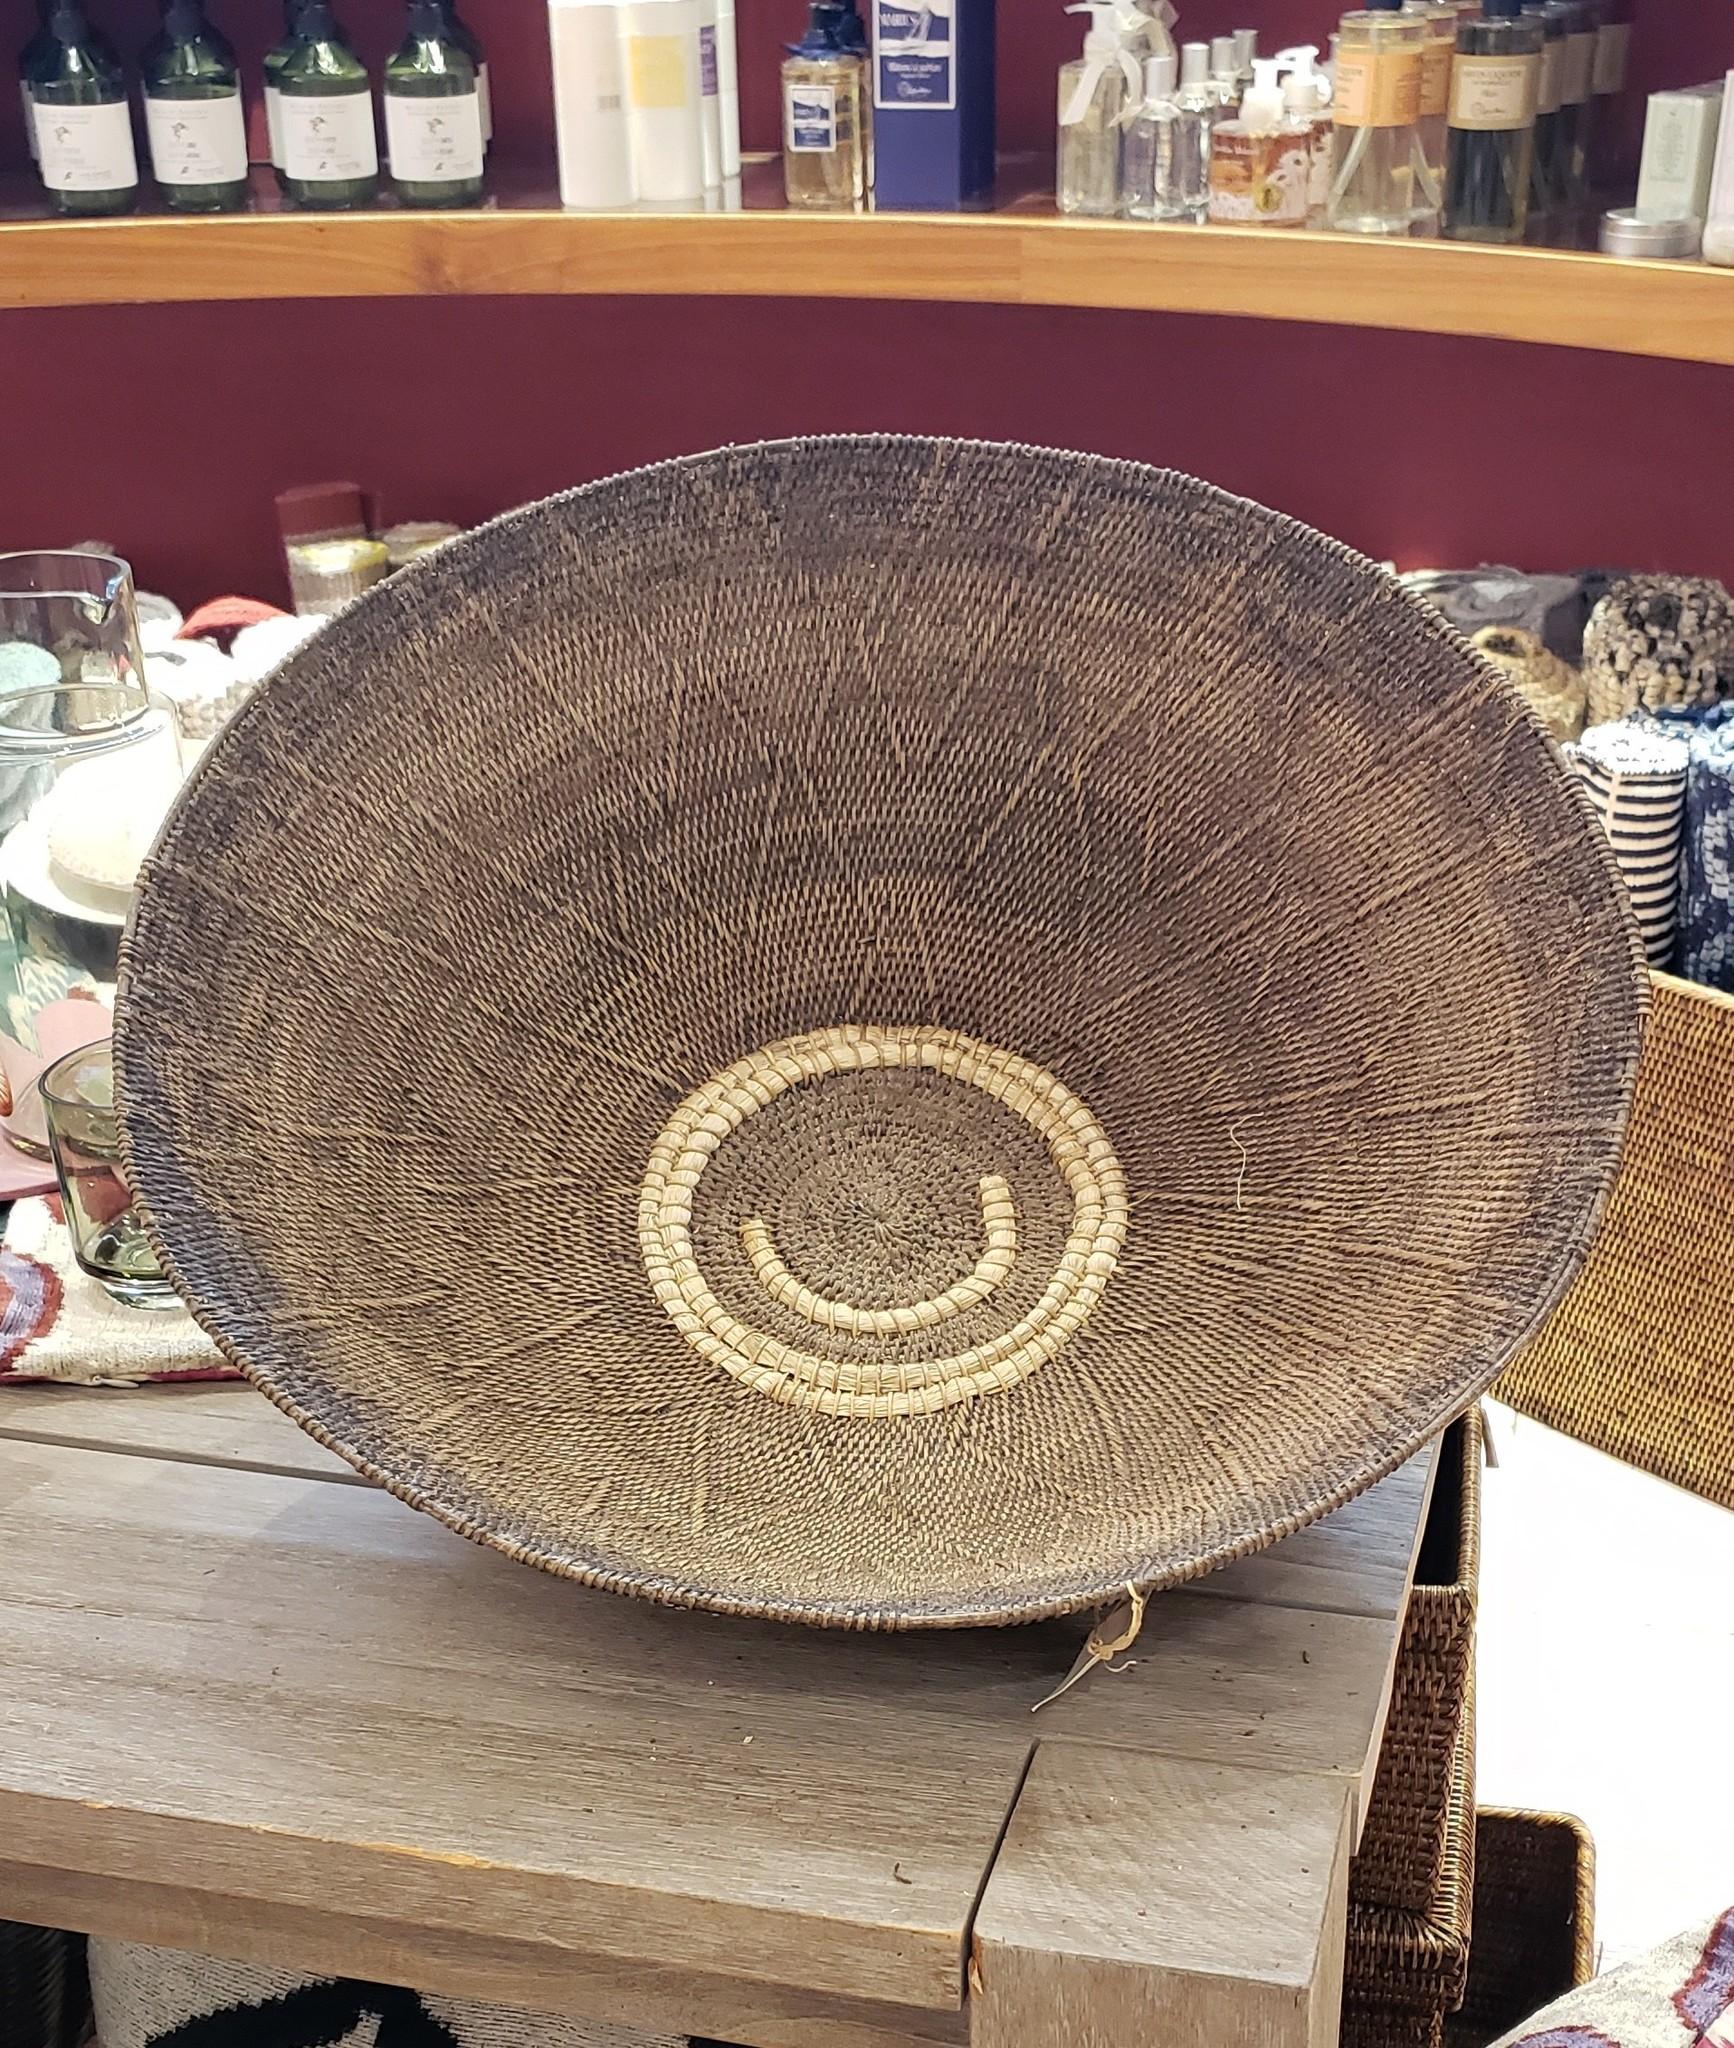 Basket by Toka #39A-2